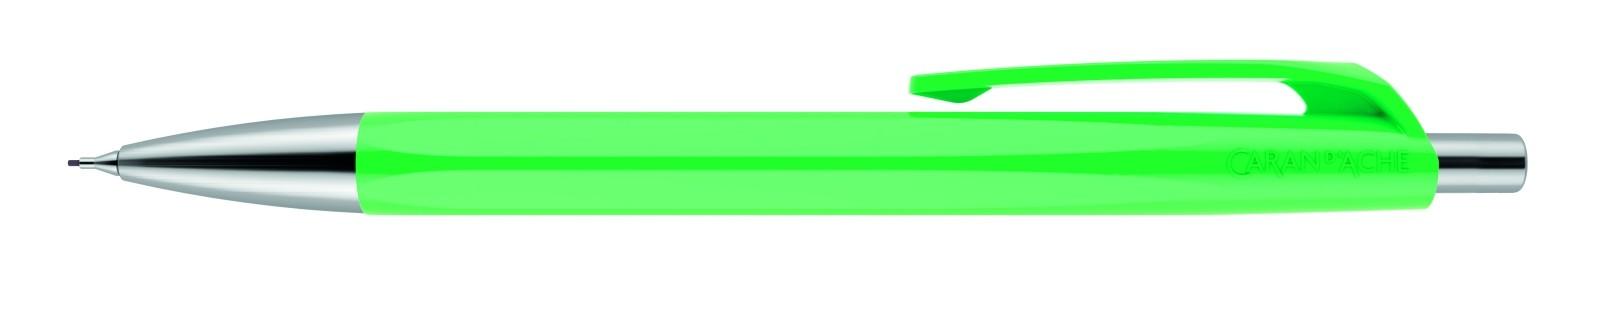 LAPISEIRA 0,7mm 884.201 INFINITE VERDE VERONESE